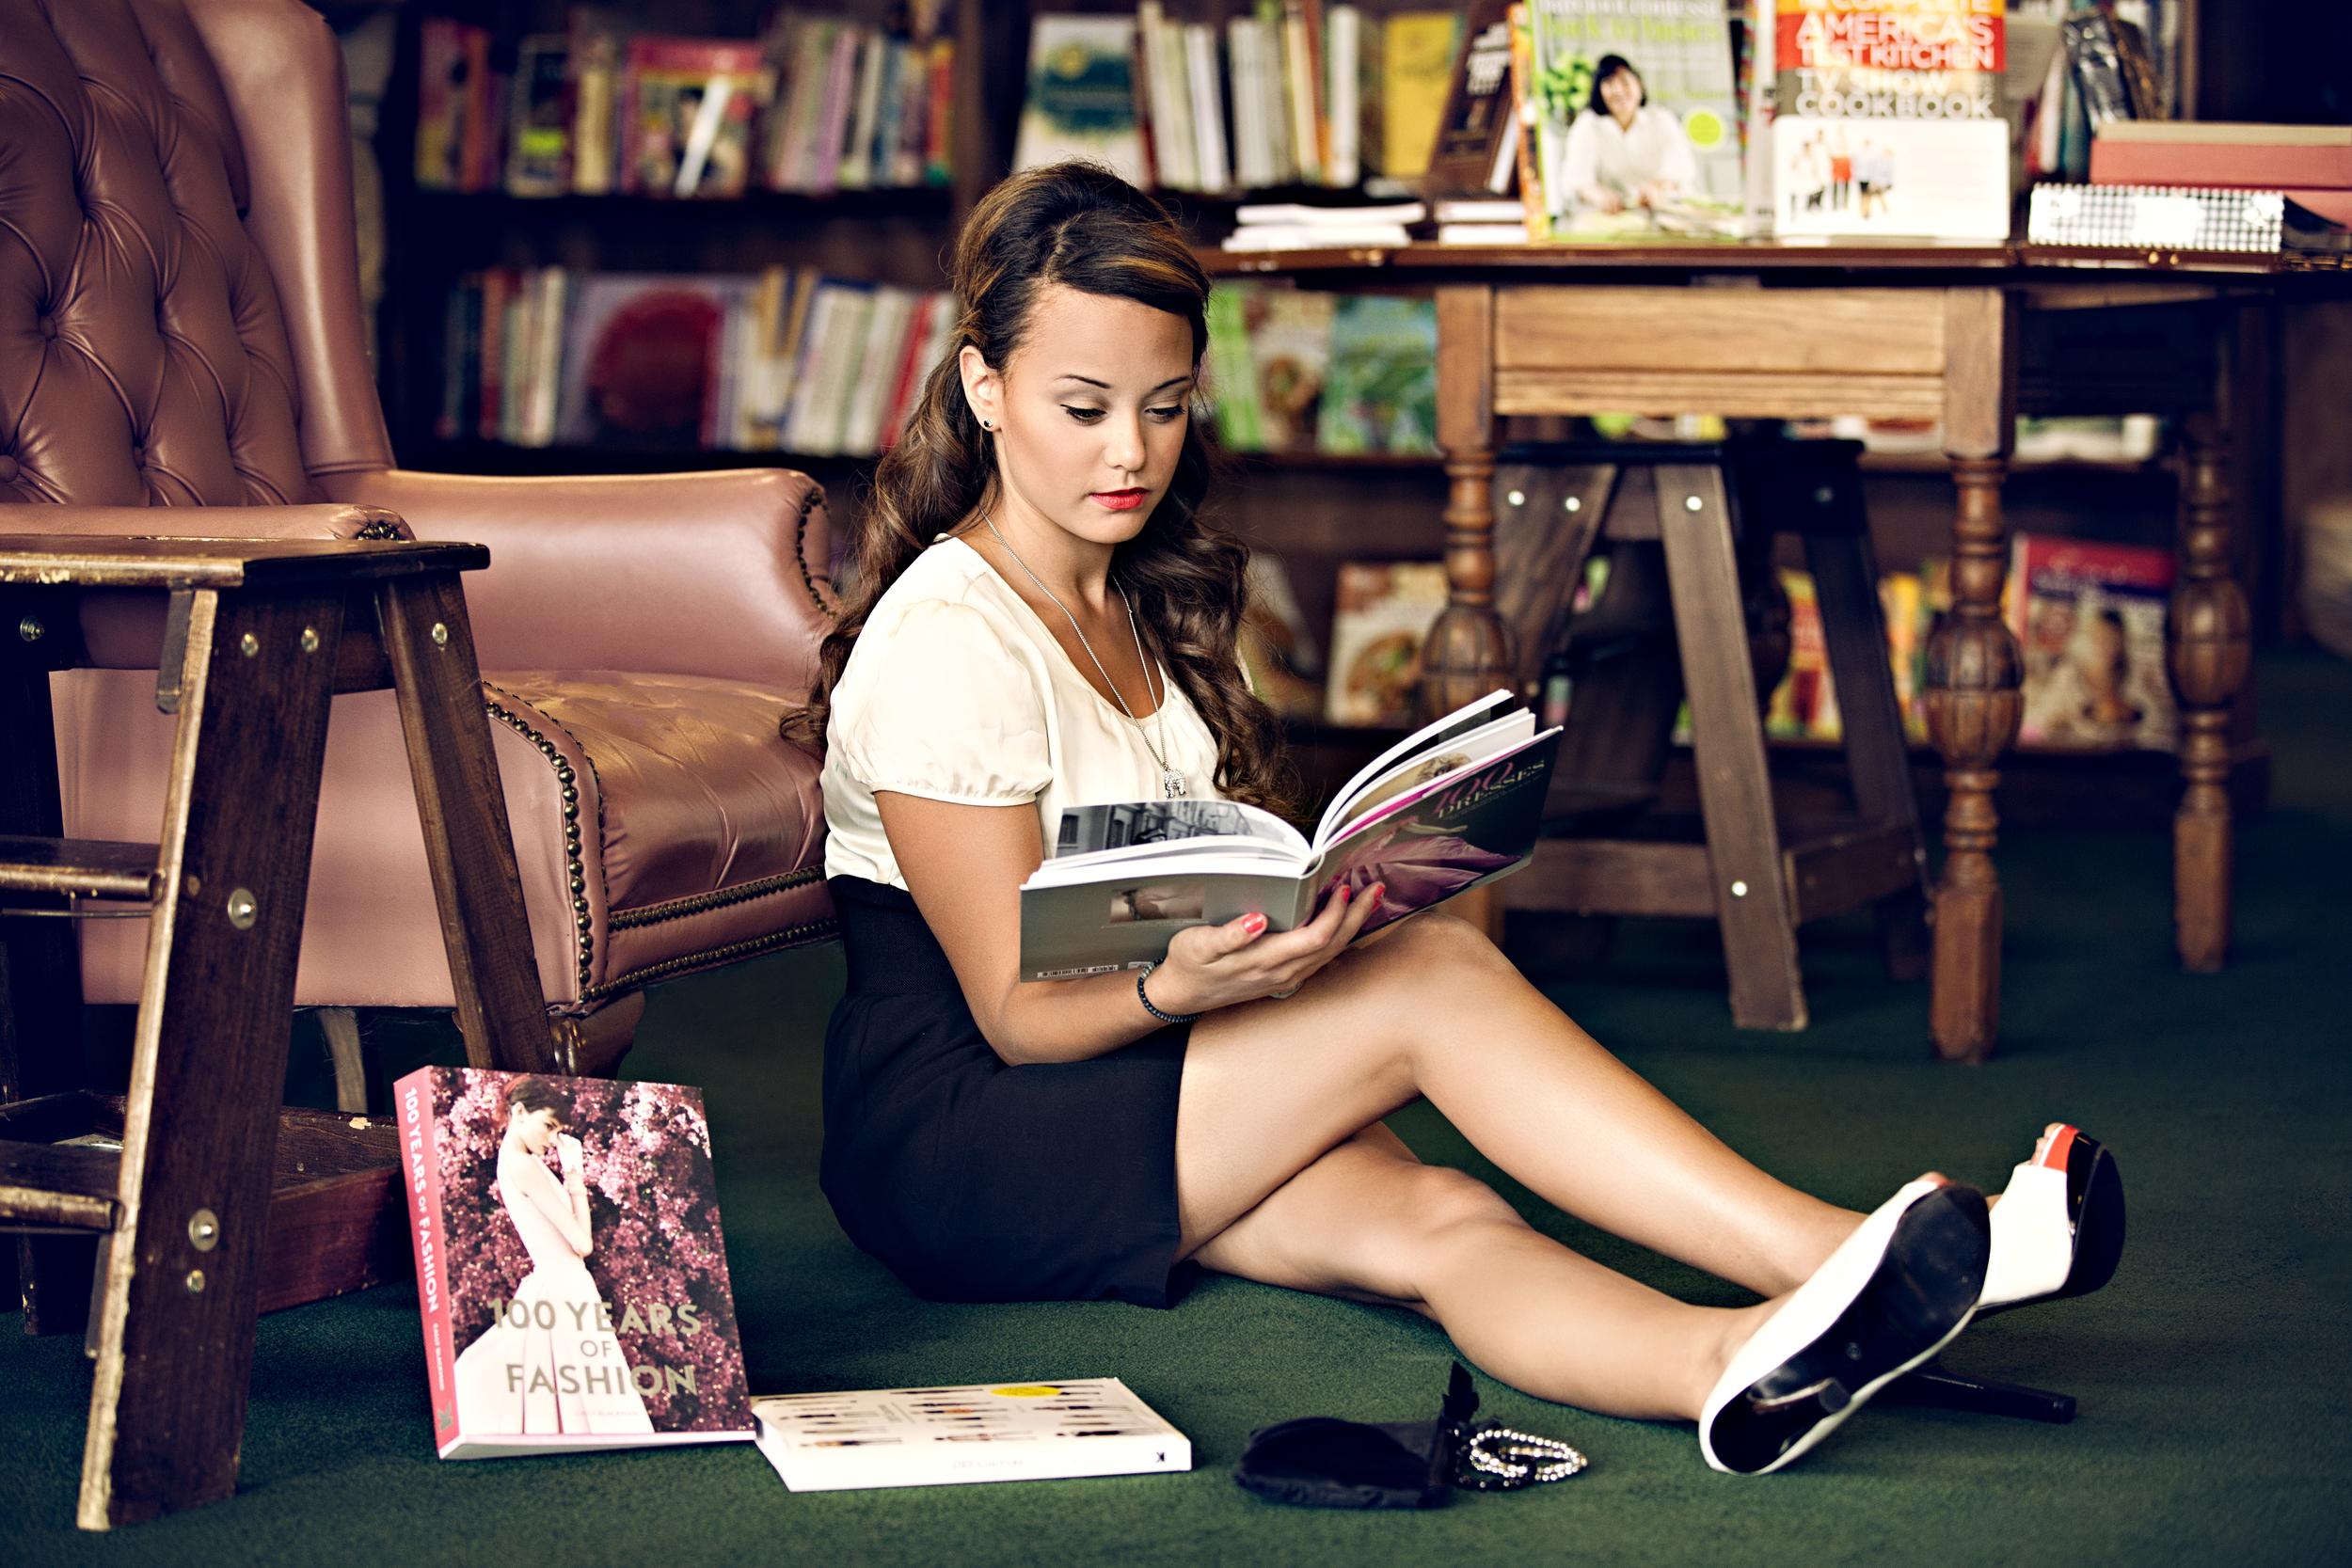 Photographer: Vidhi Thakur  Model: BreeAnna Hilsenrath Location: Tattered Cover Book Store,  Denver, Colorado